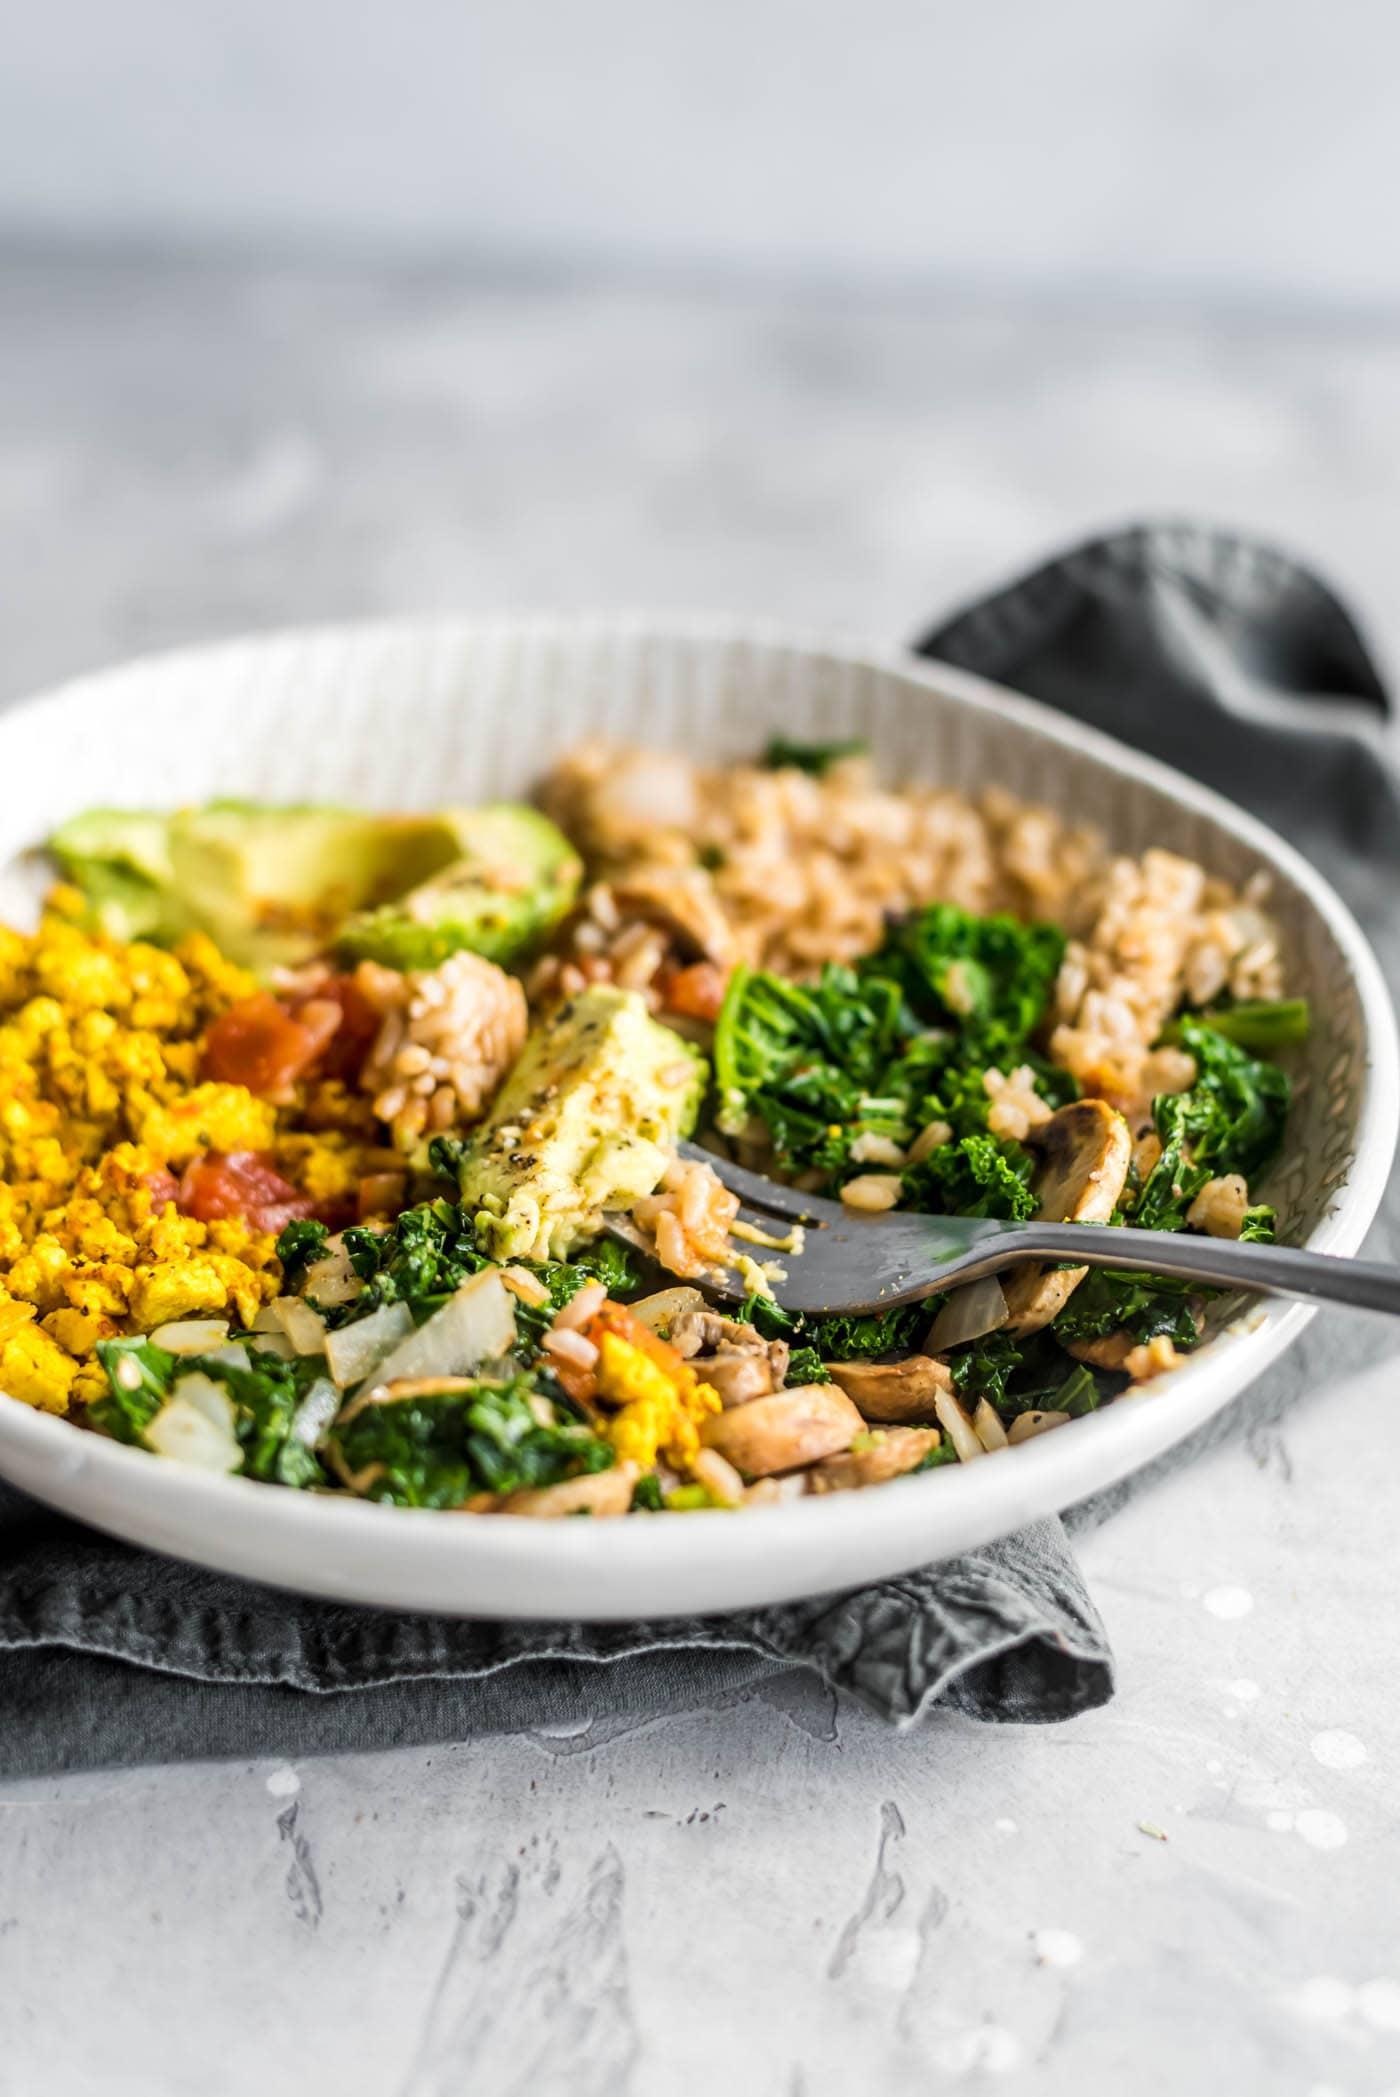 Avocado in a savory vegan breakfast bowl with kale, tofu scramble, rice and salsa.